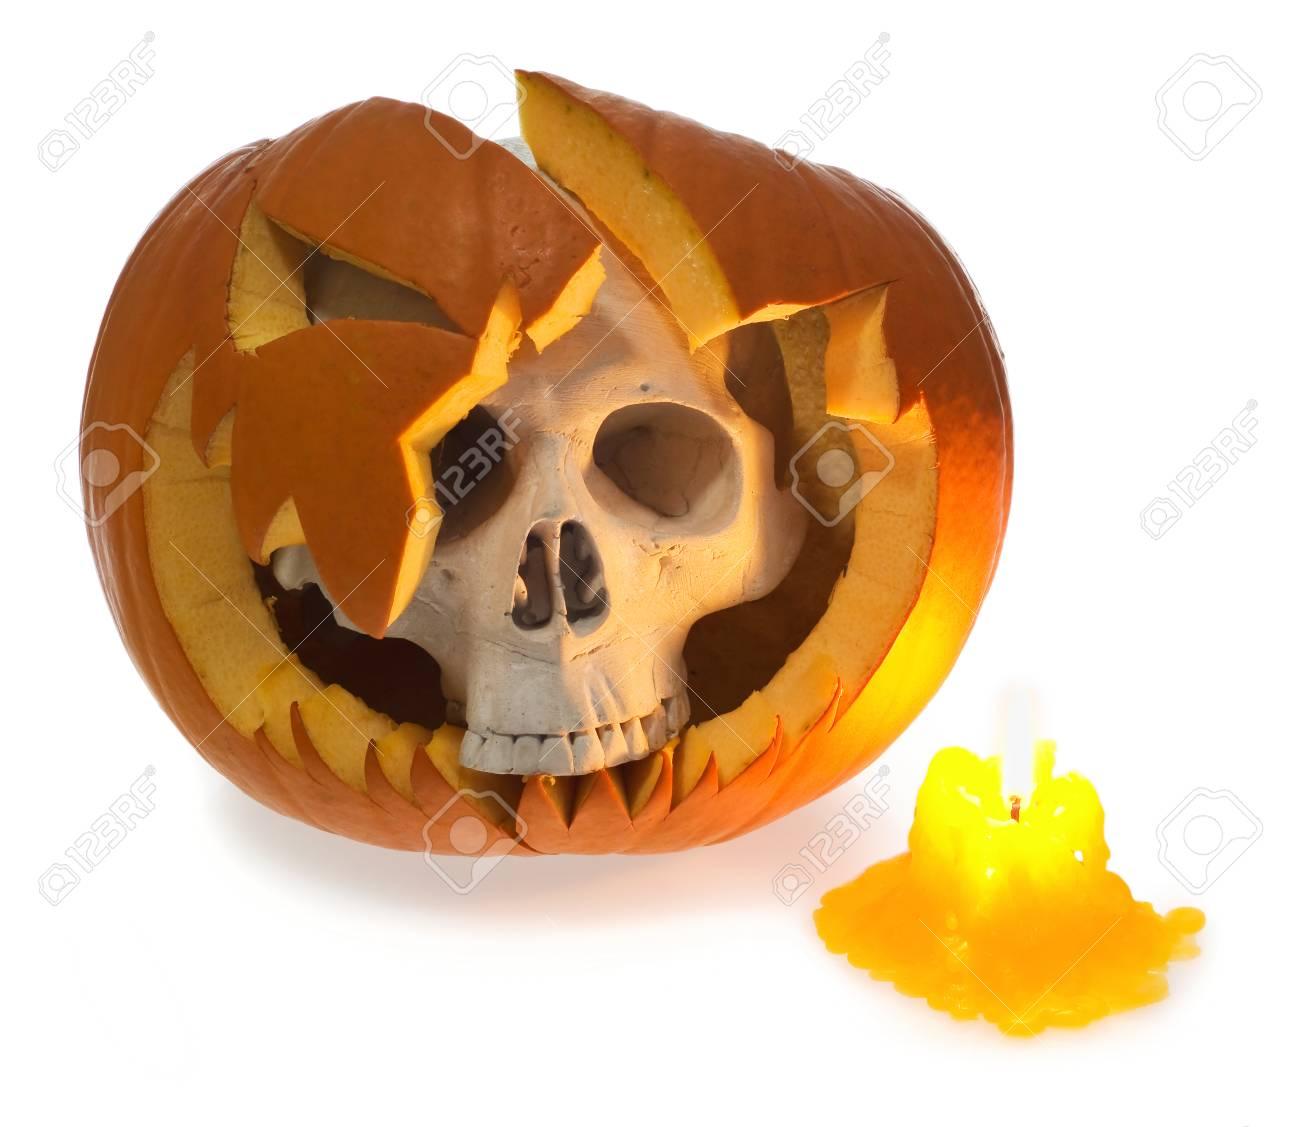 Halloween Ghost Human Skull Comes Out Of A Broken Pumpkin Skeleton